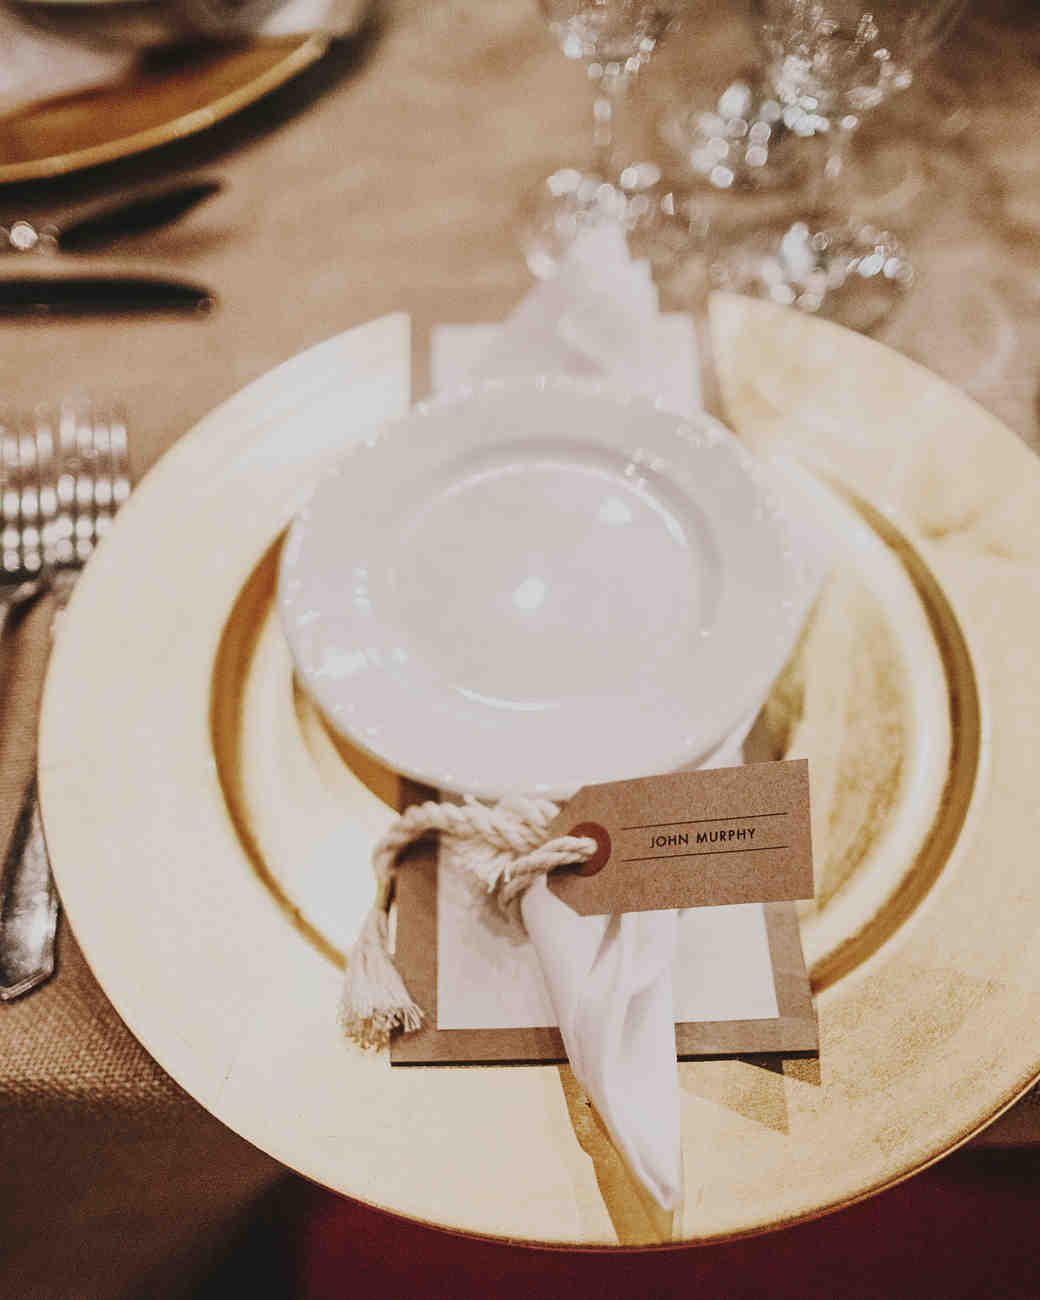 tamara-brett-wedding-placesetting-1314-s112120-0915.jpg